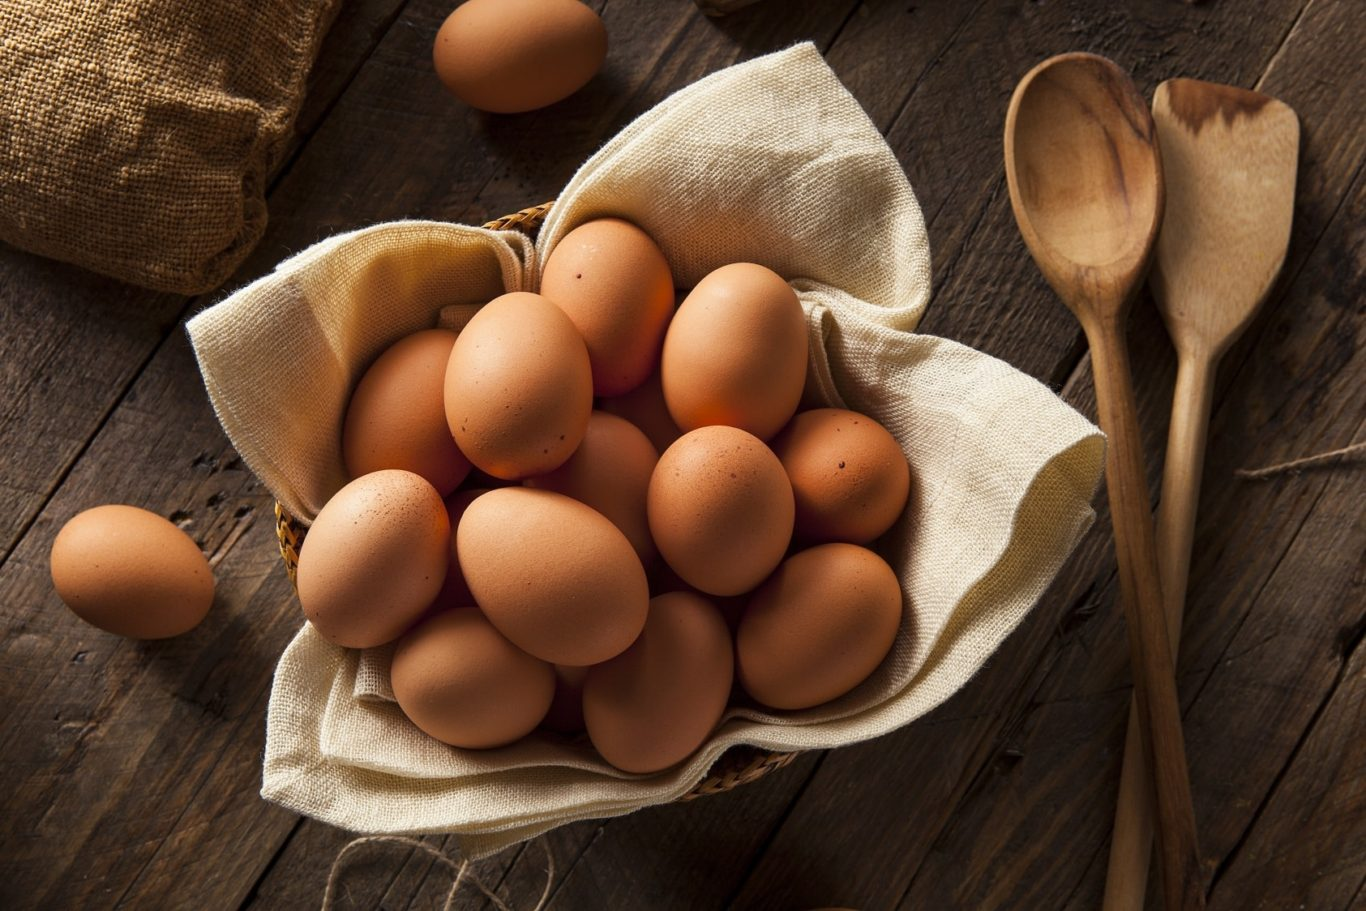 Bowel of Raw Organic Brown Eggs